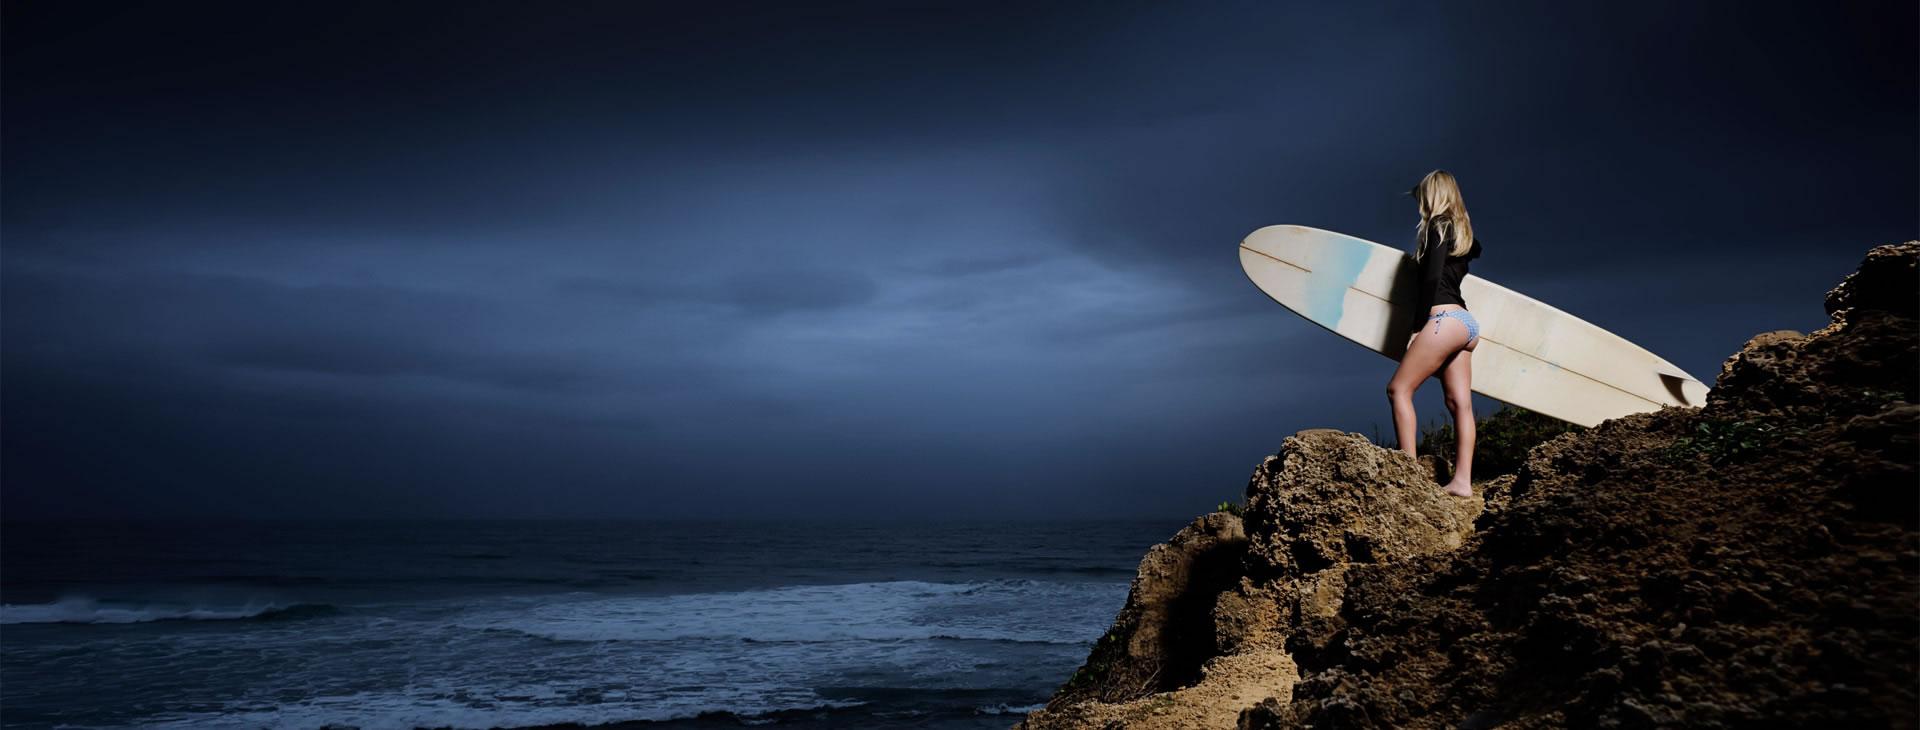 Scuola di surf en Tenerife sur